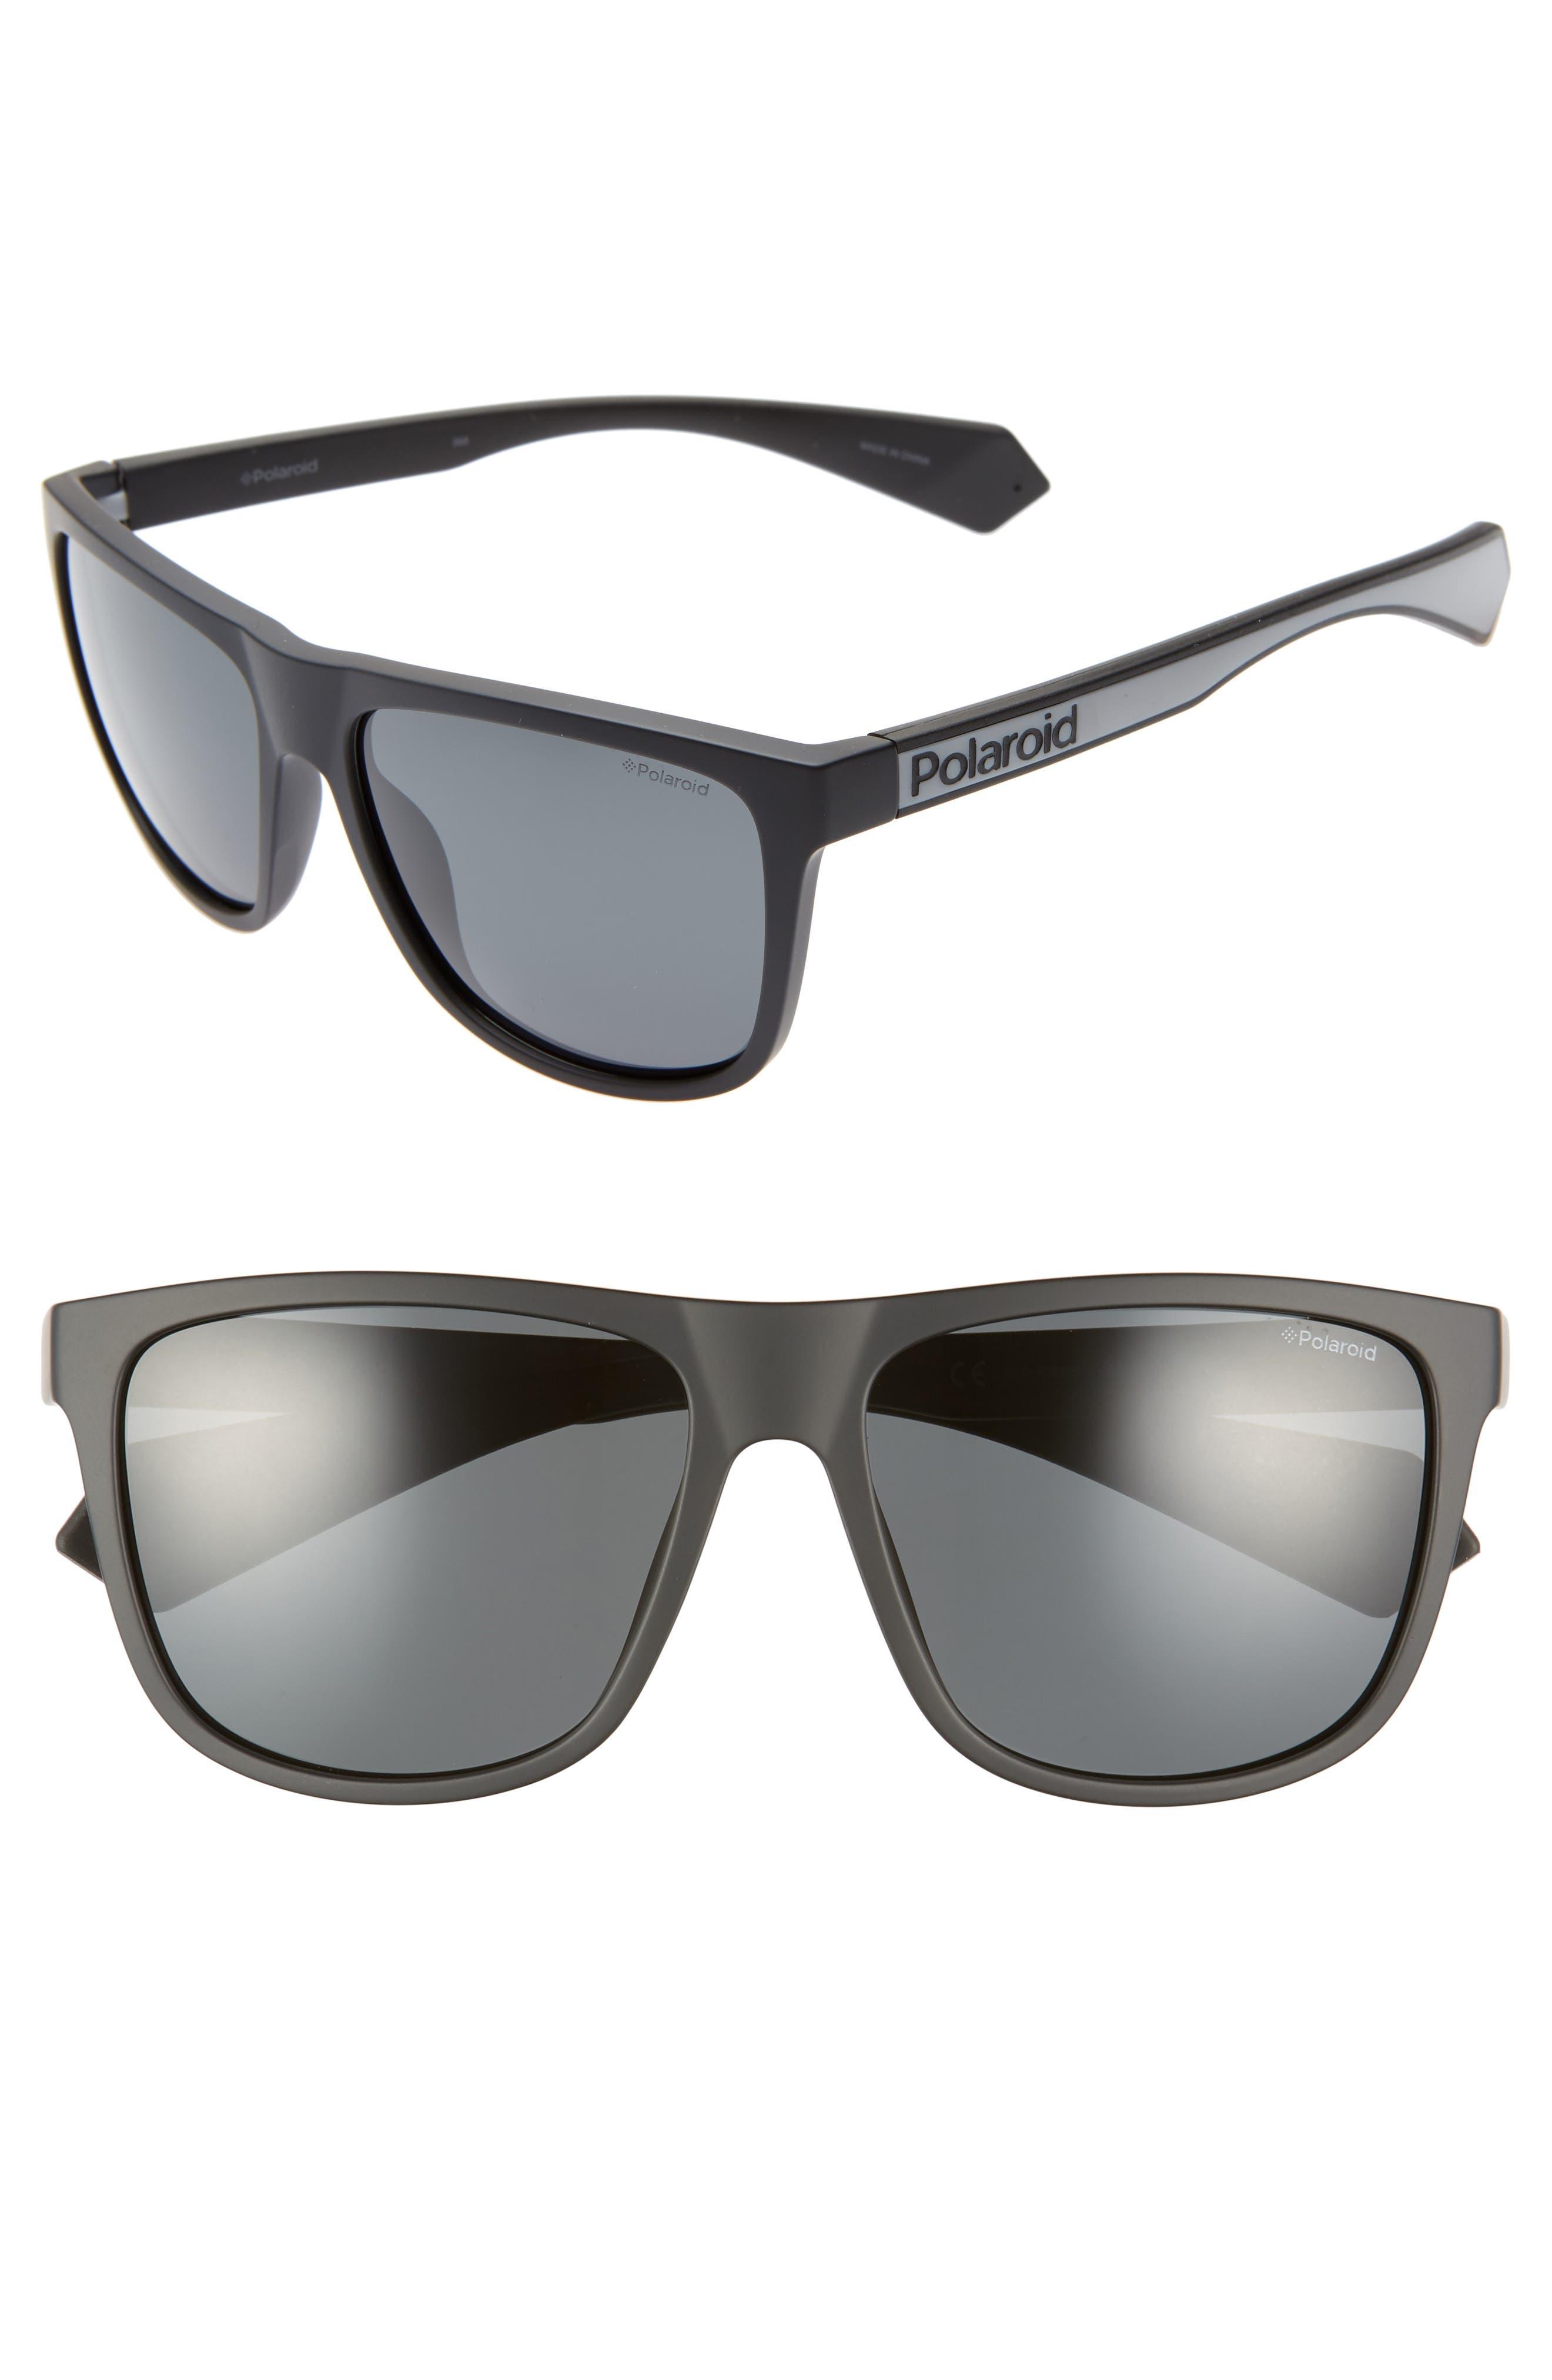 Polaroid Plastic Core 57Mm Polarized Sunglasses - Black